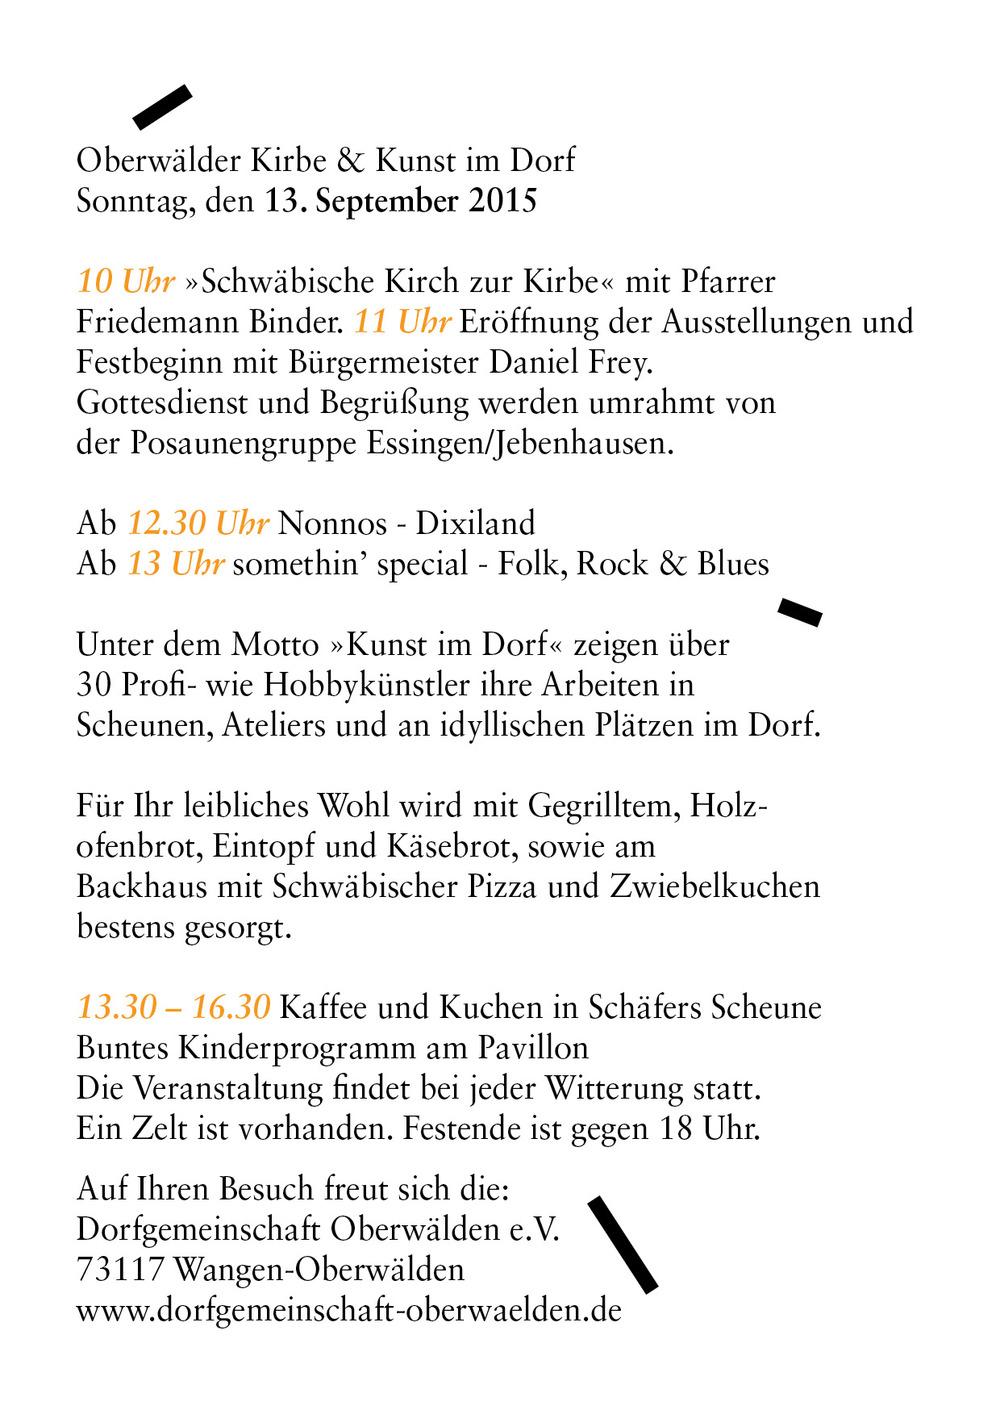 Oberwaelden_Kirbe_2015_Programm